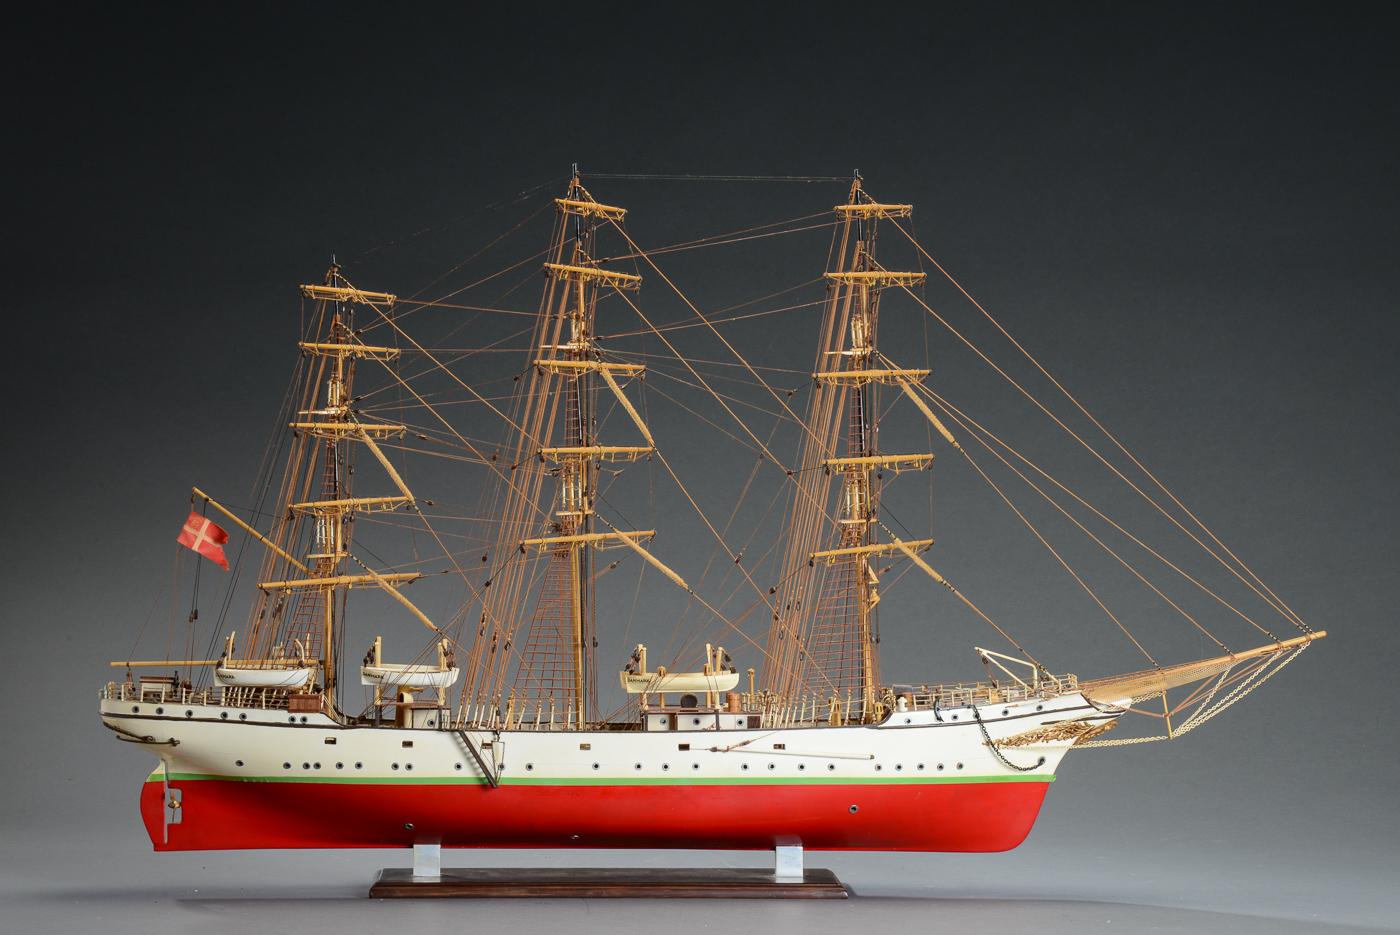 Skoleskibet Danmark - håndbygget tre-mastet fuldrigger modelskib i delvist bemalet træ - Skoleskibet Danmark - håndbygget tre-mastet fuldrigger modelskib i delvist bemalet træ. Rigt detaljeret. Med stand. H. 60. L. 103 cm. B. 14 cm